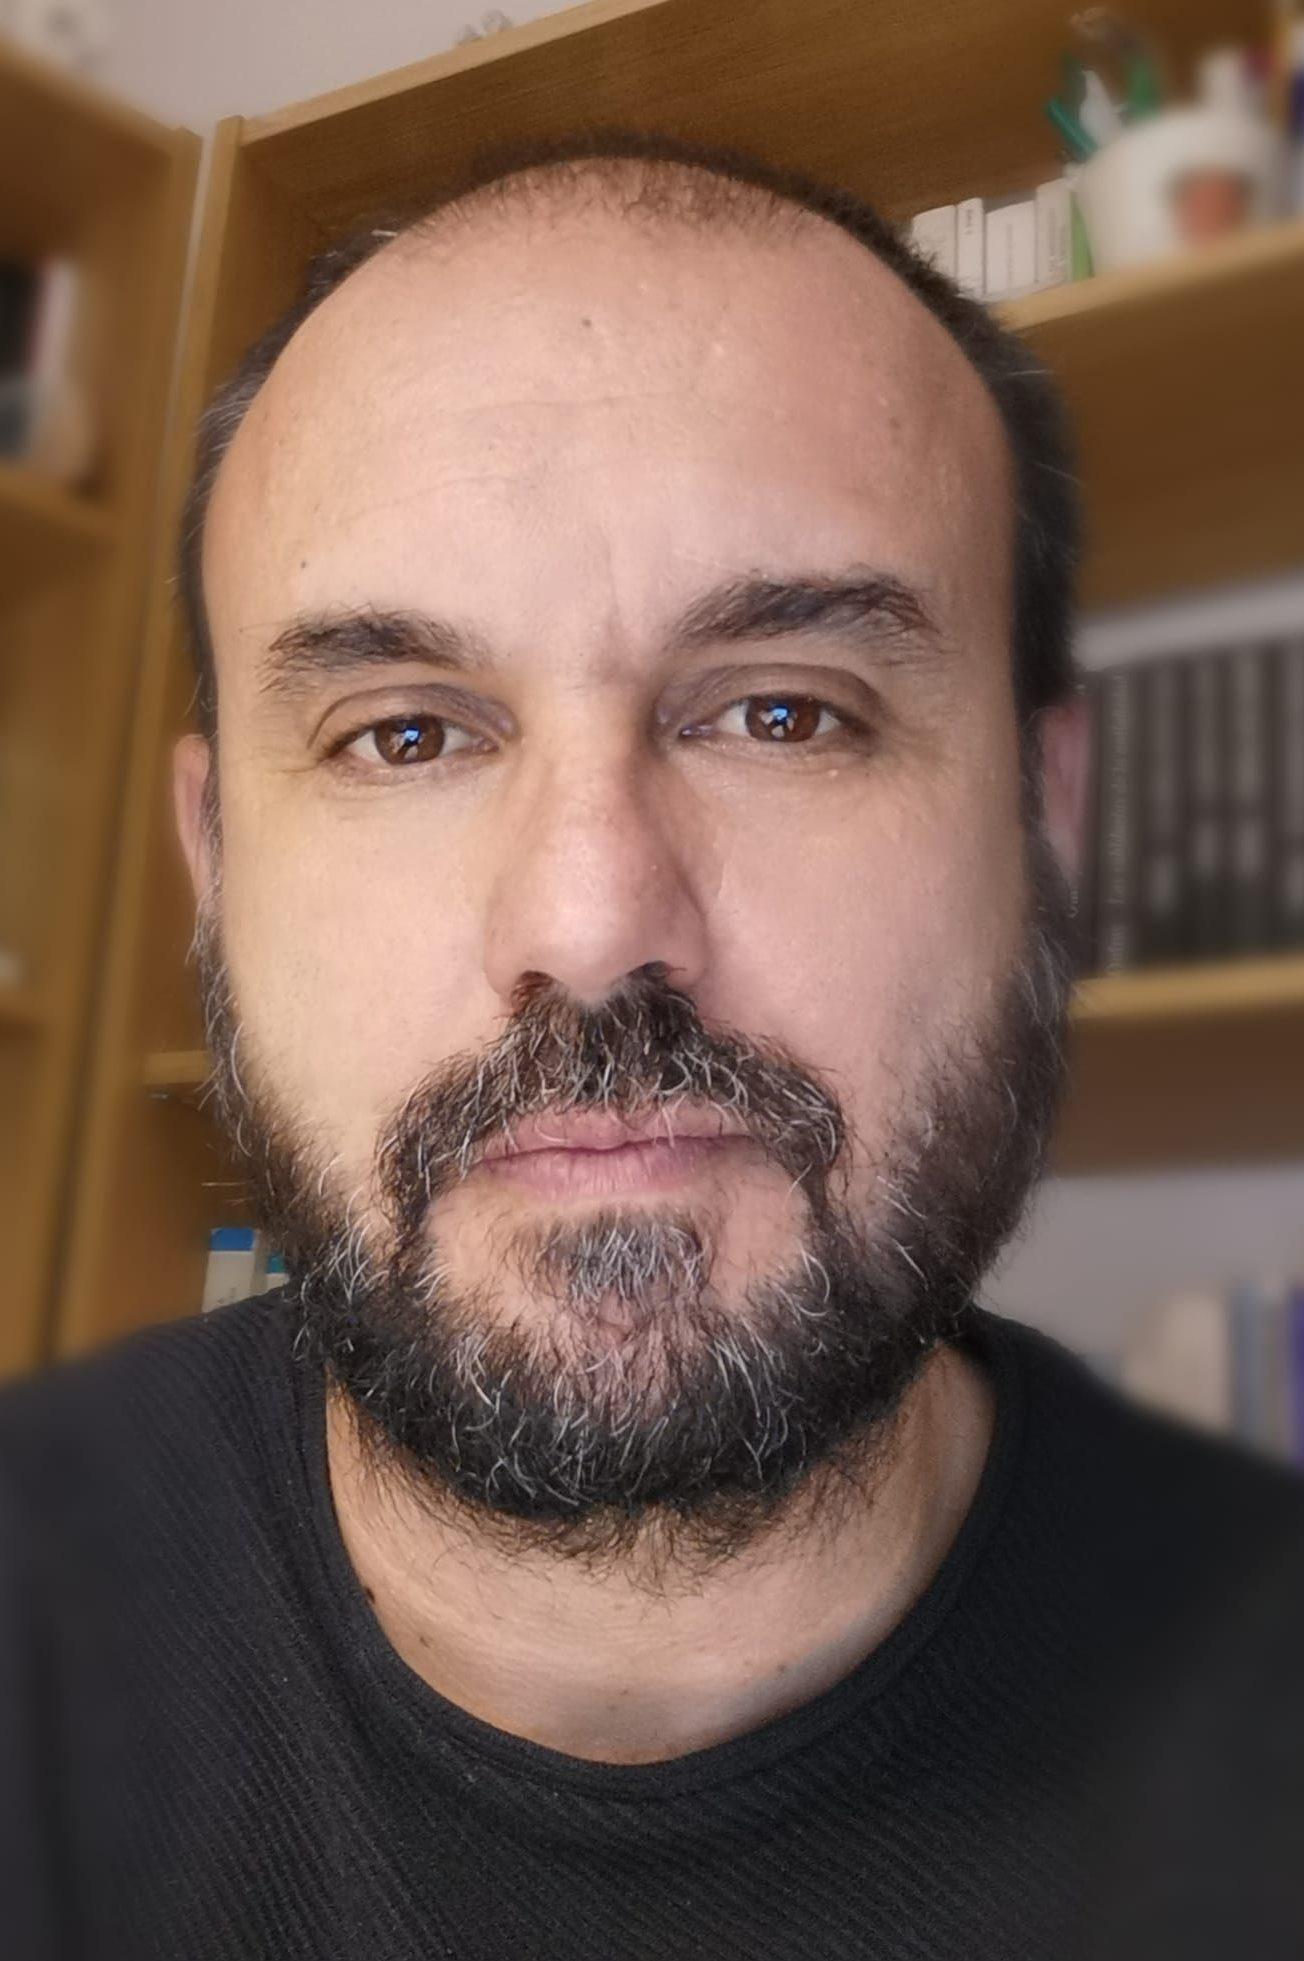 Pablo Martínez Romero